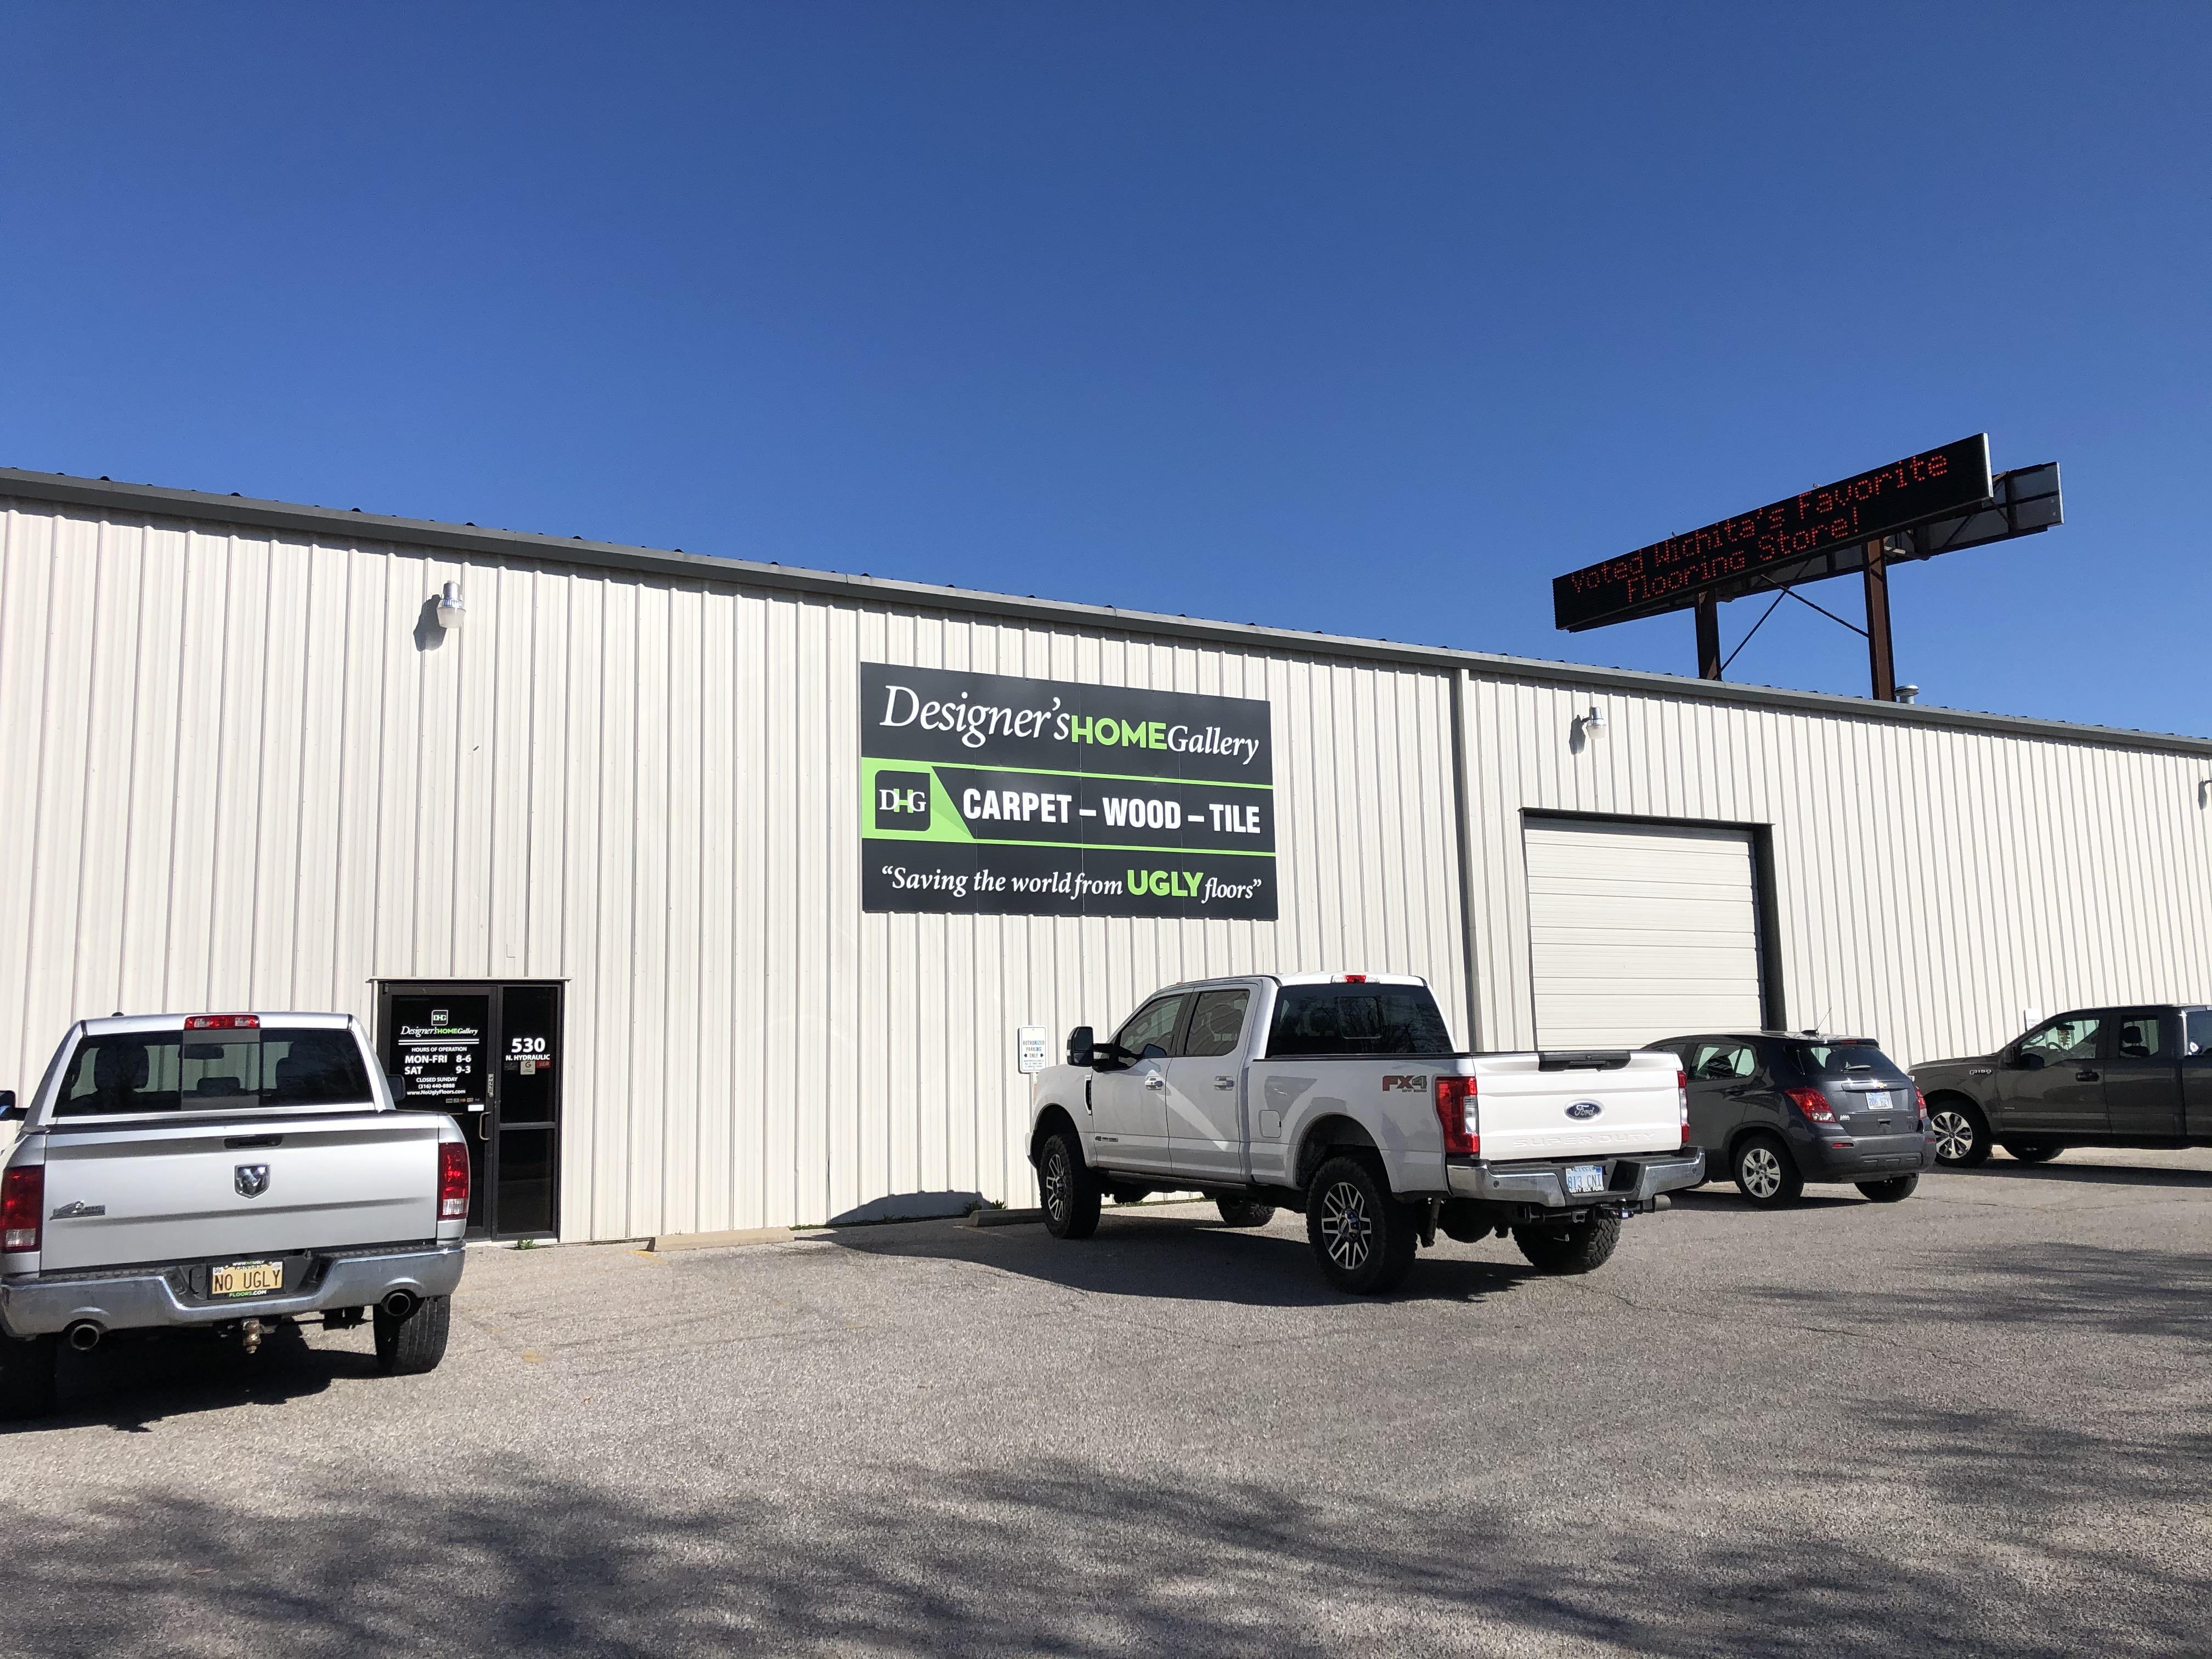 Designer's Home Gallery - 530 N Hydraulic Ave, Wichita, KS 67214